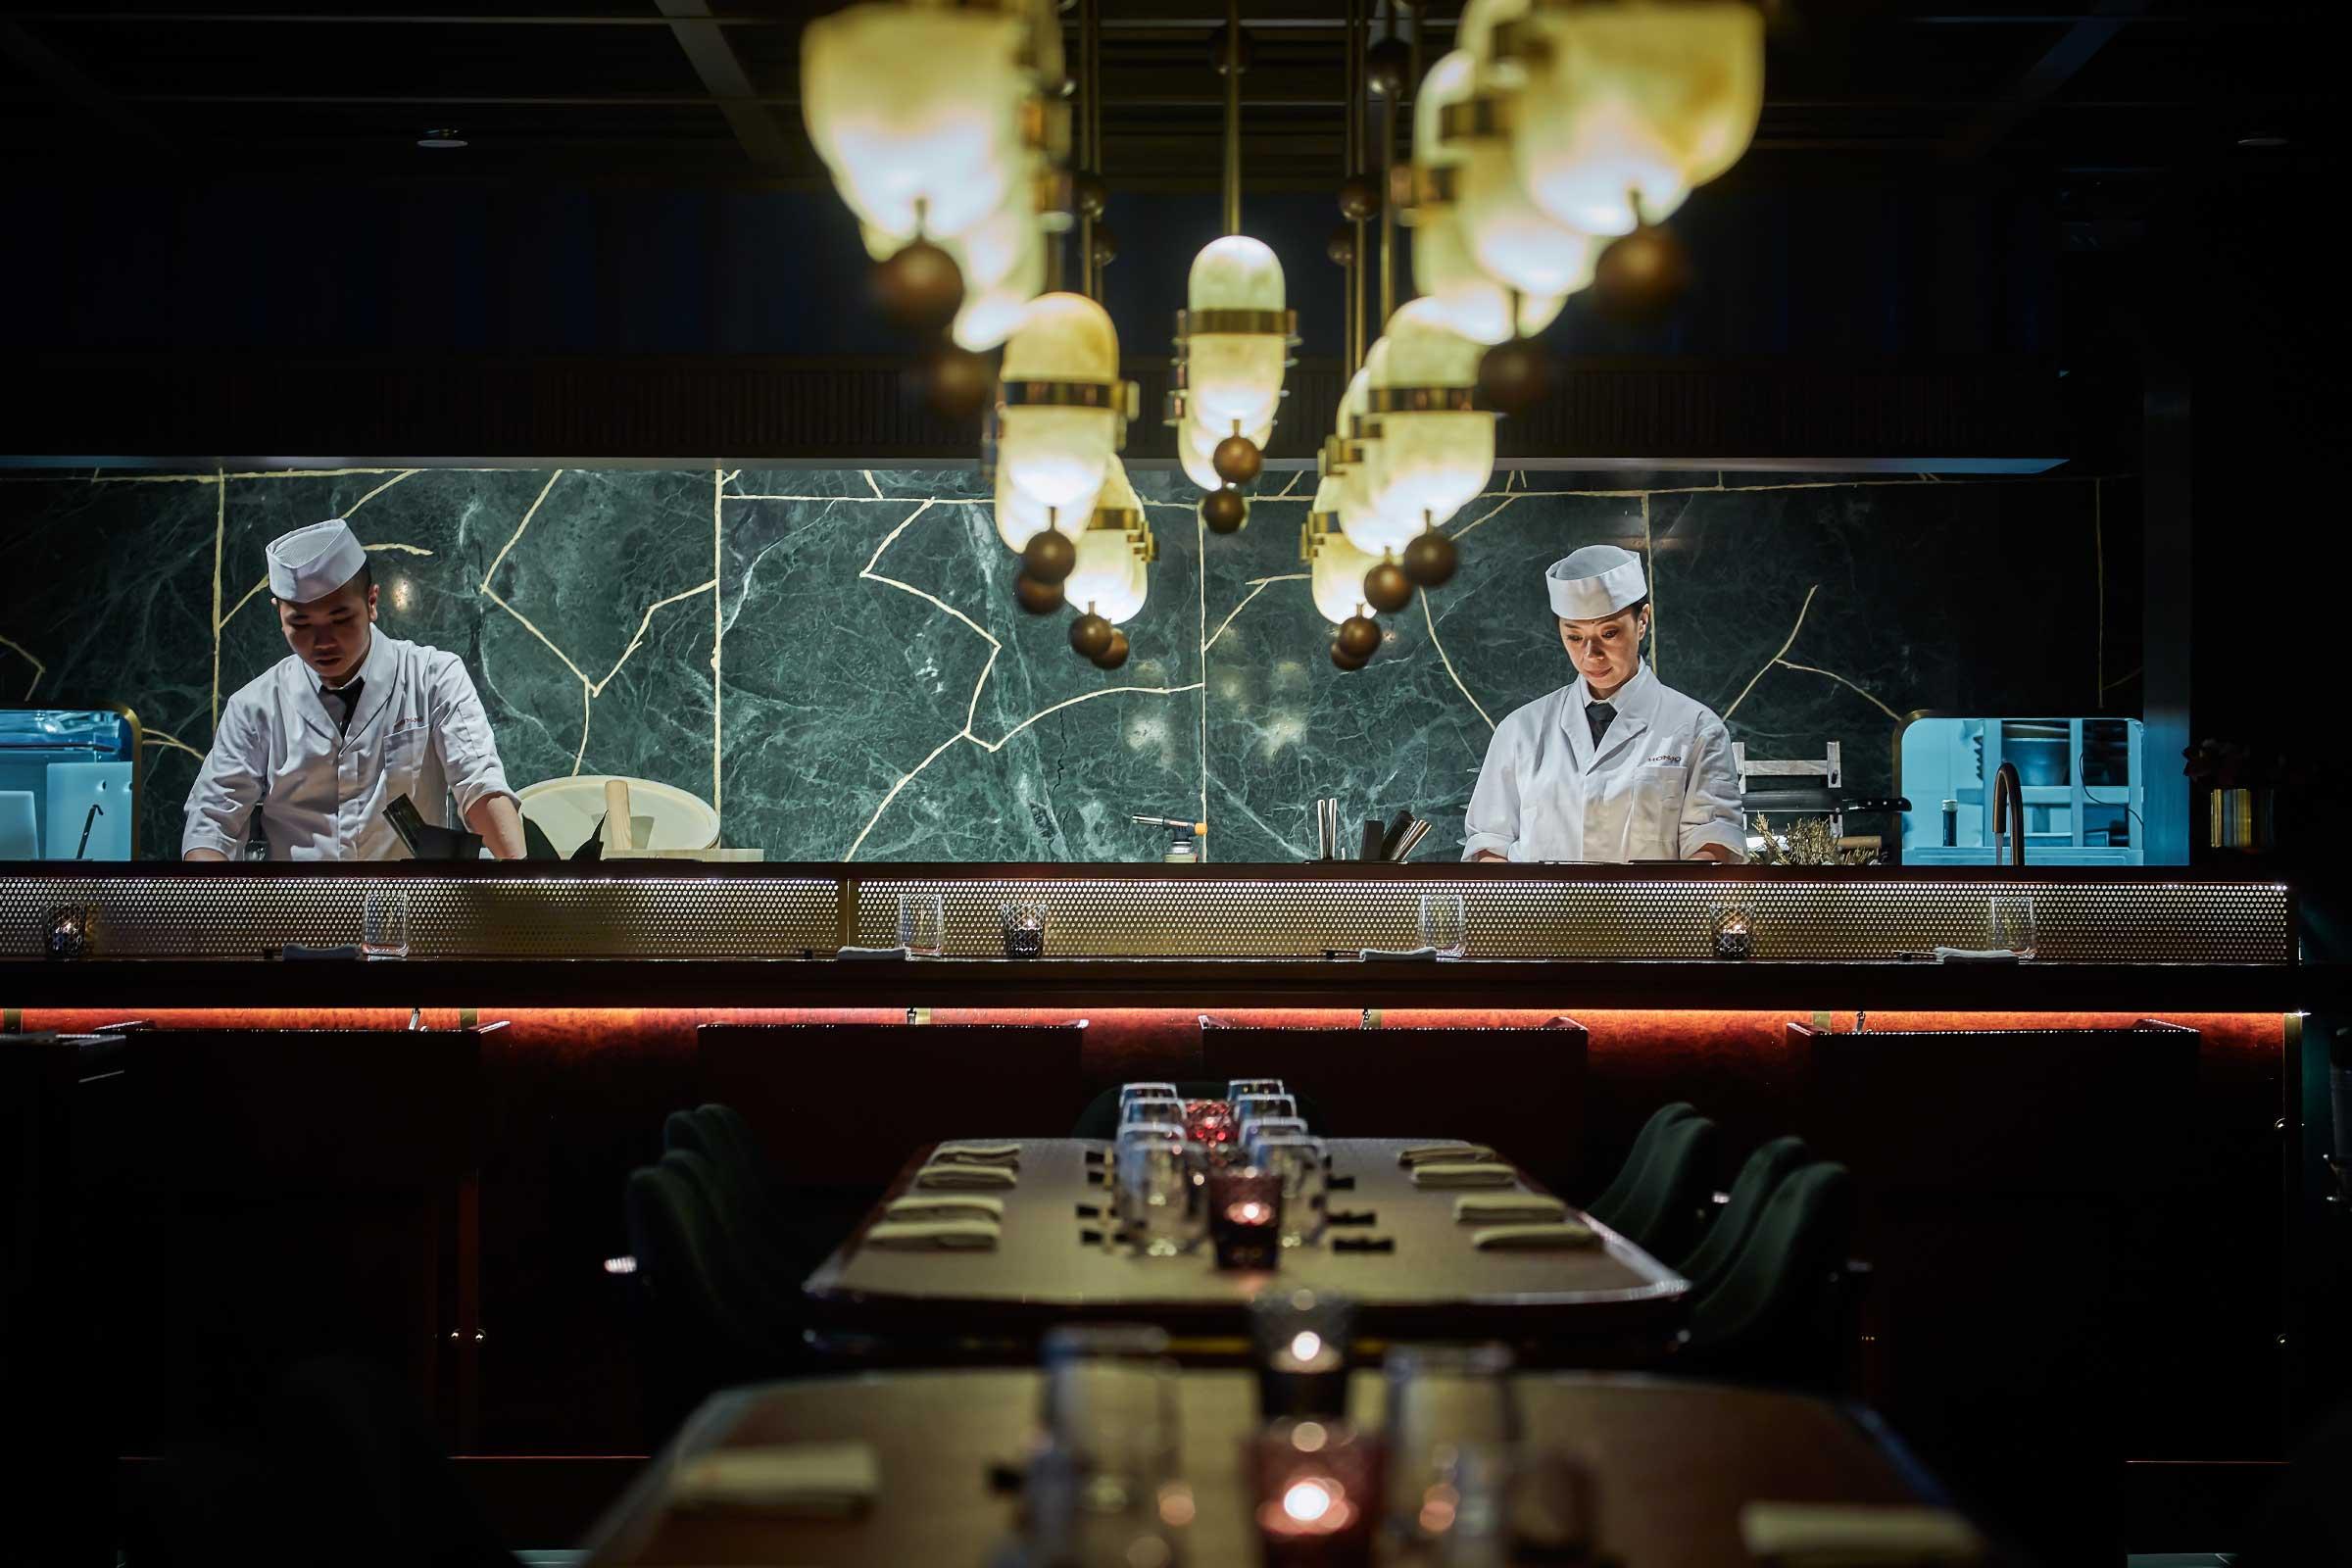 Honjo---Interior---Sushi-and-Sashimi-Bar-01.jpg